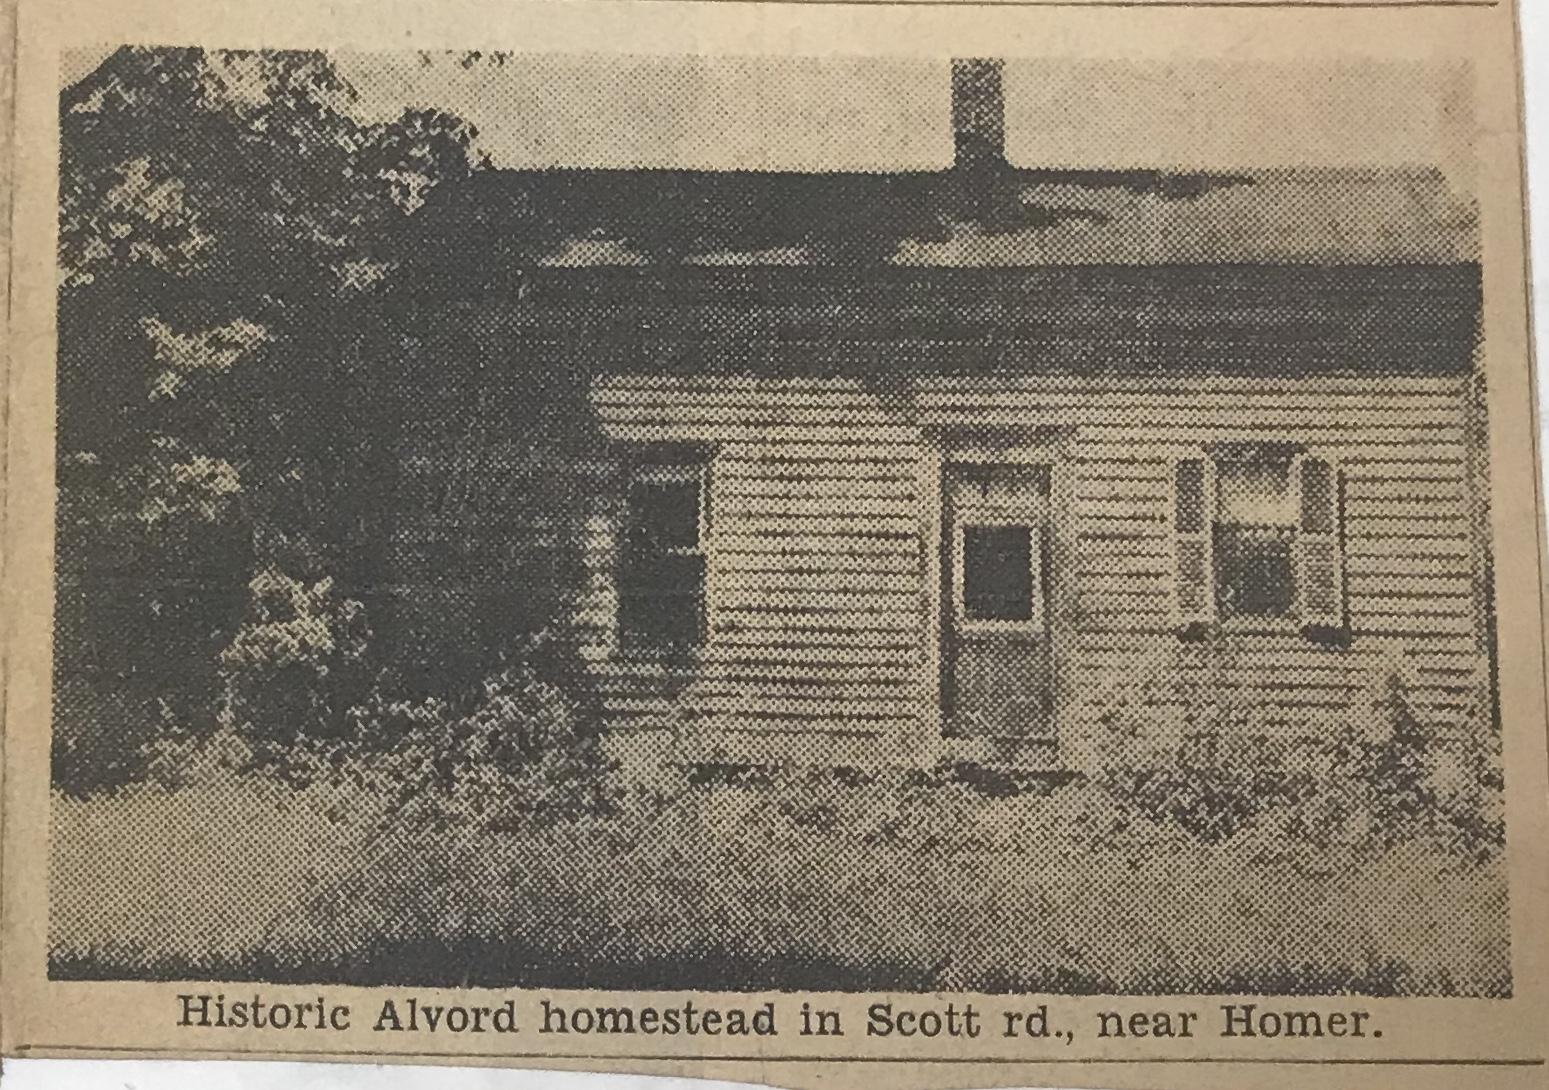 Historic Alvord homestead in Scott rd., near Homer